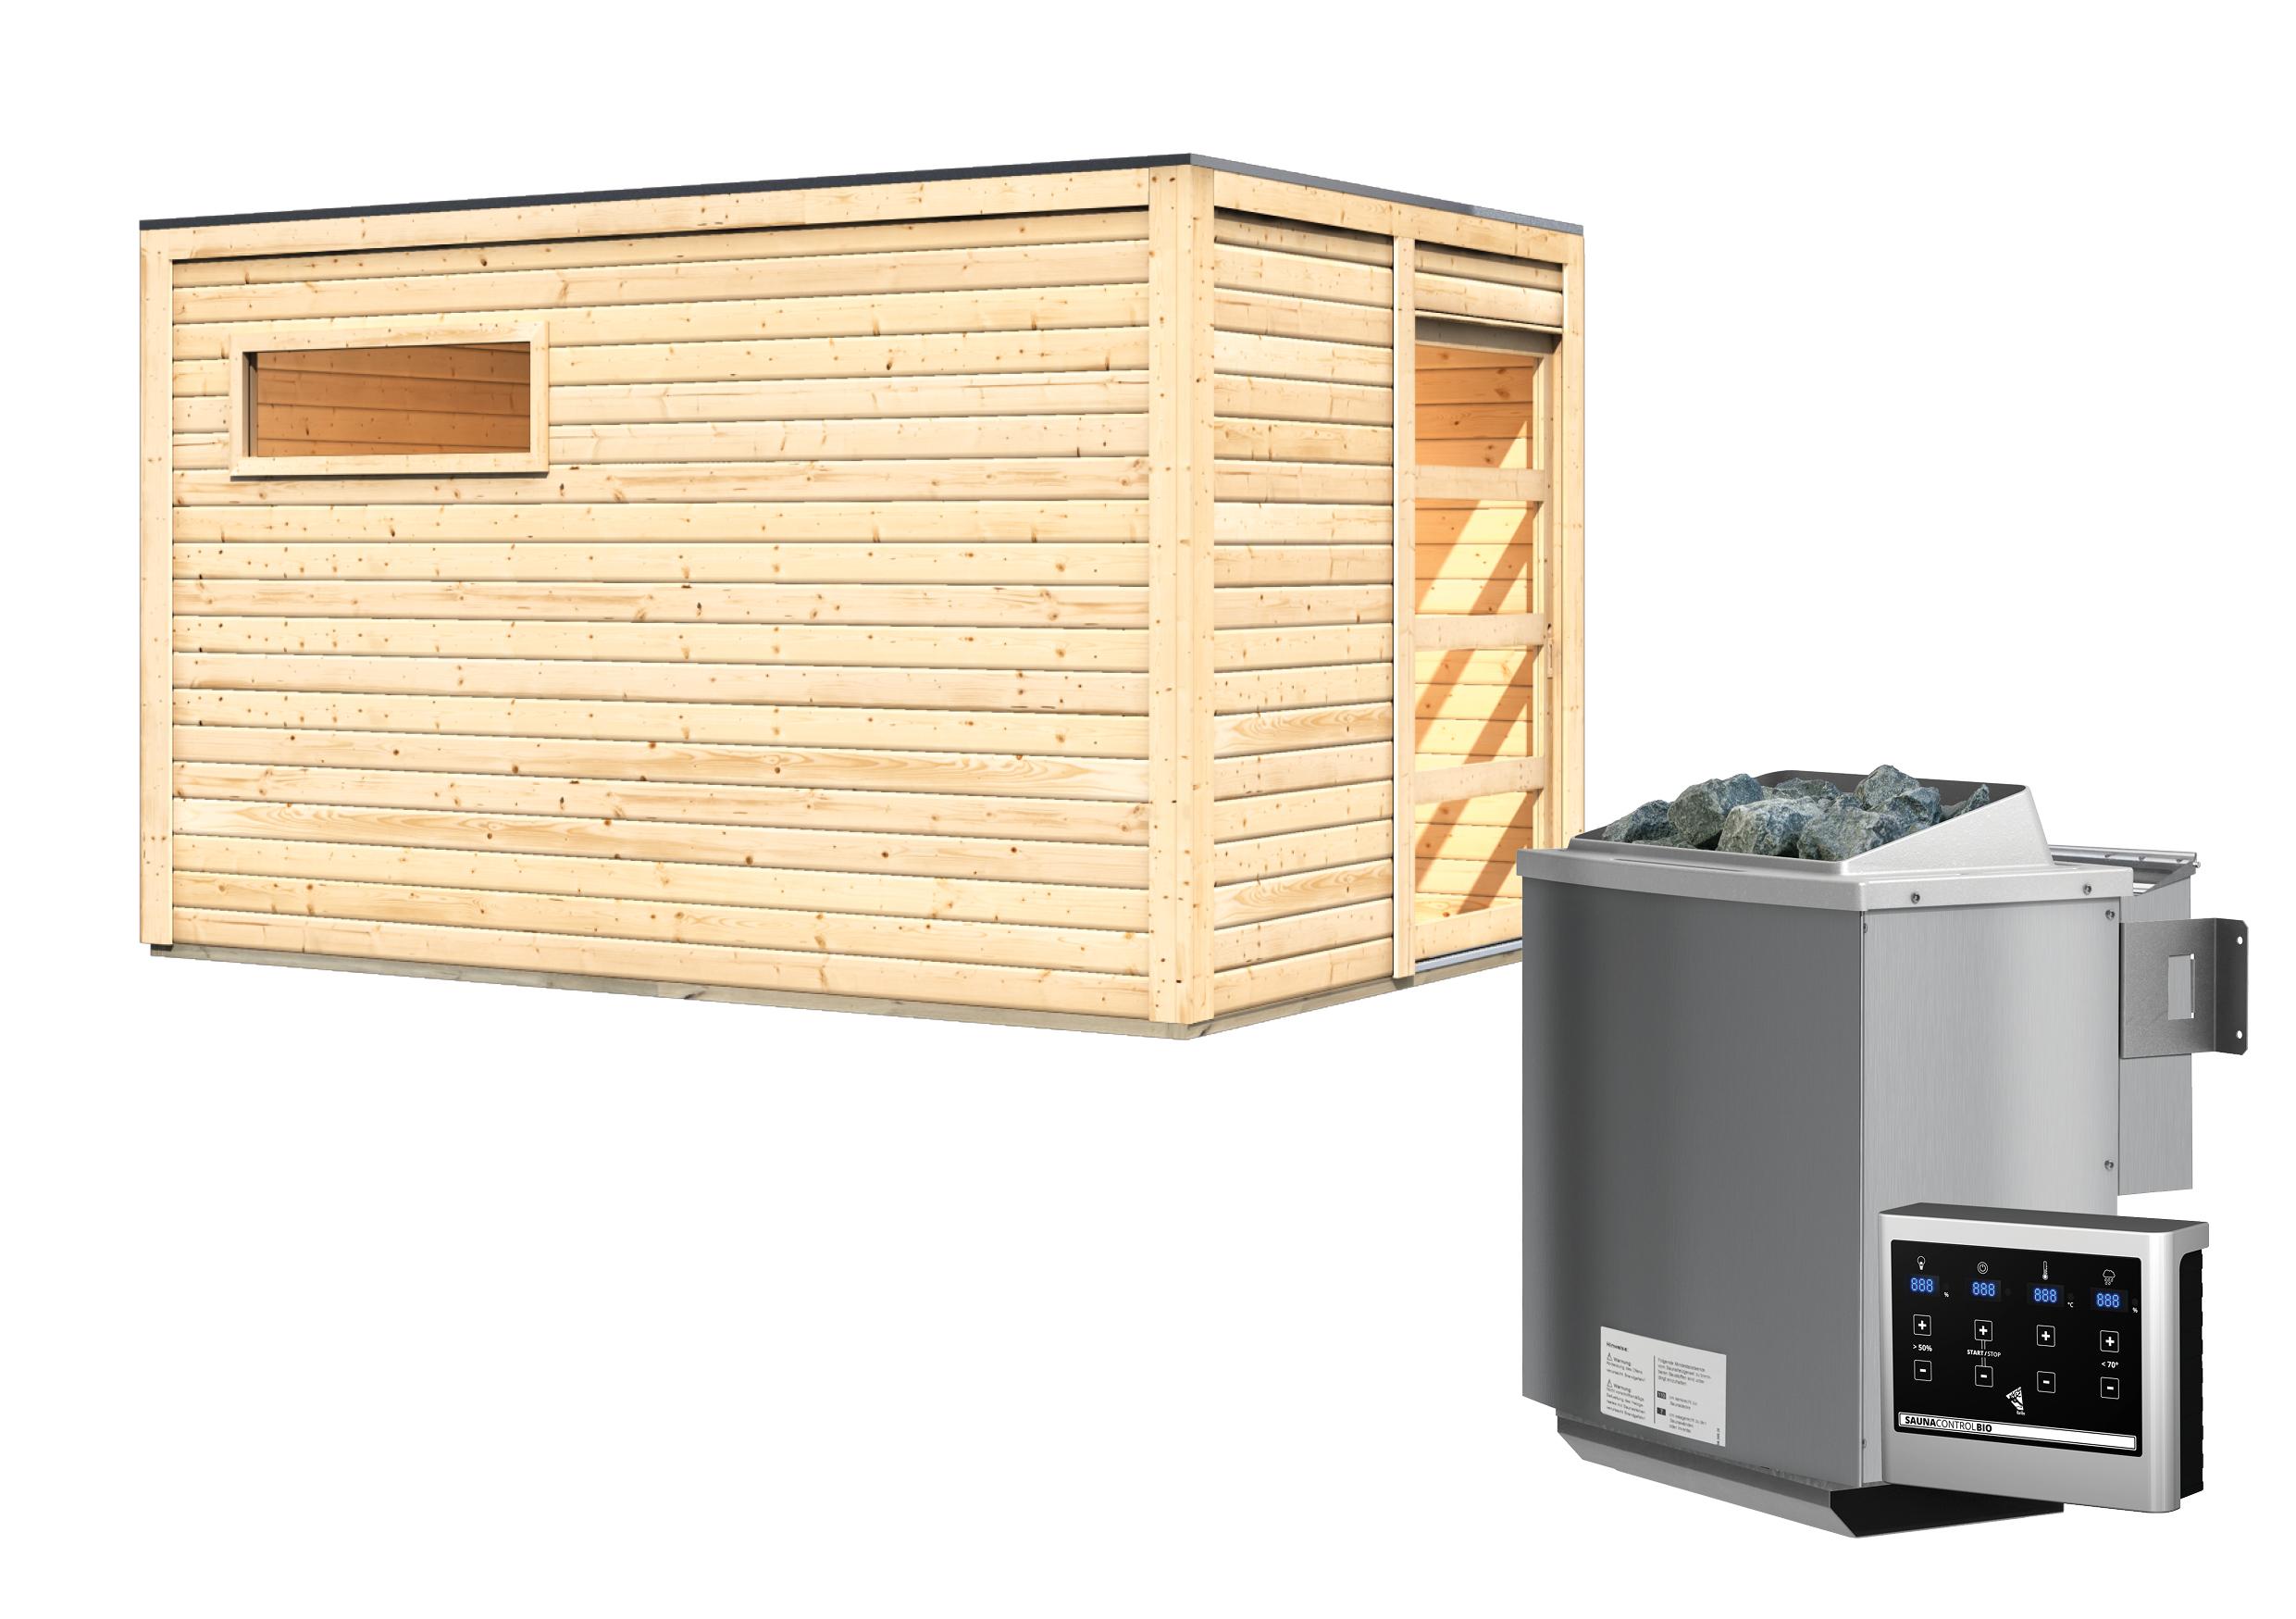 Gartensauna Karibu Saunahaus Caleb natur 38mm Bio Saunaofen 9kW extern Bild 8